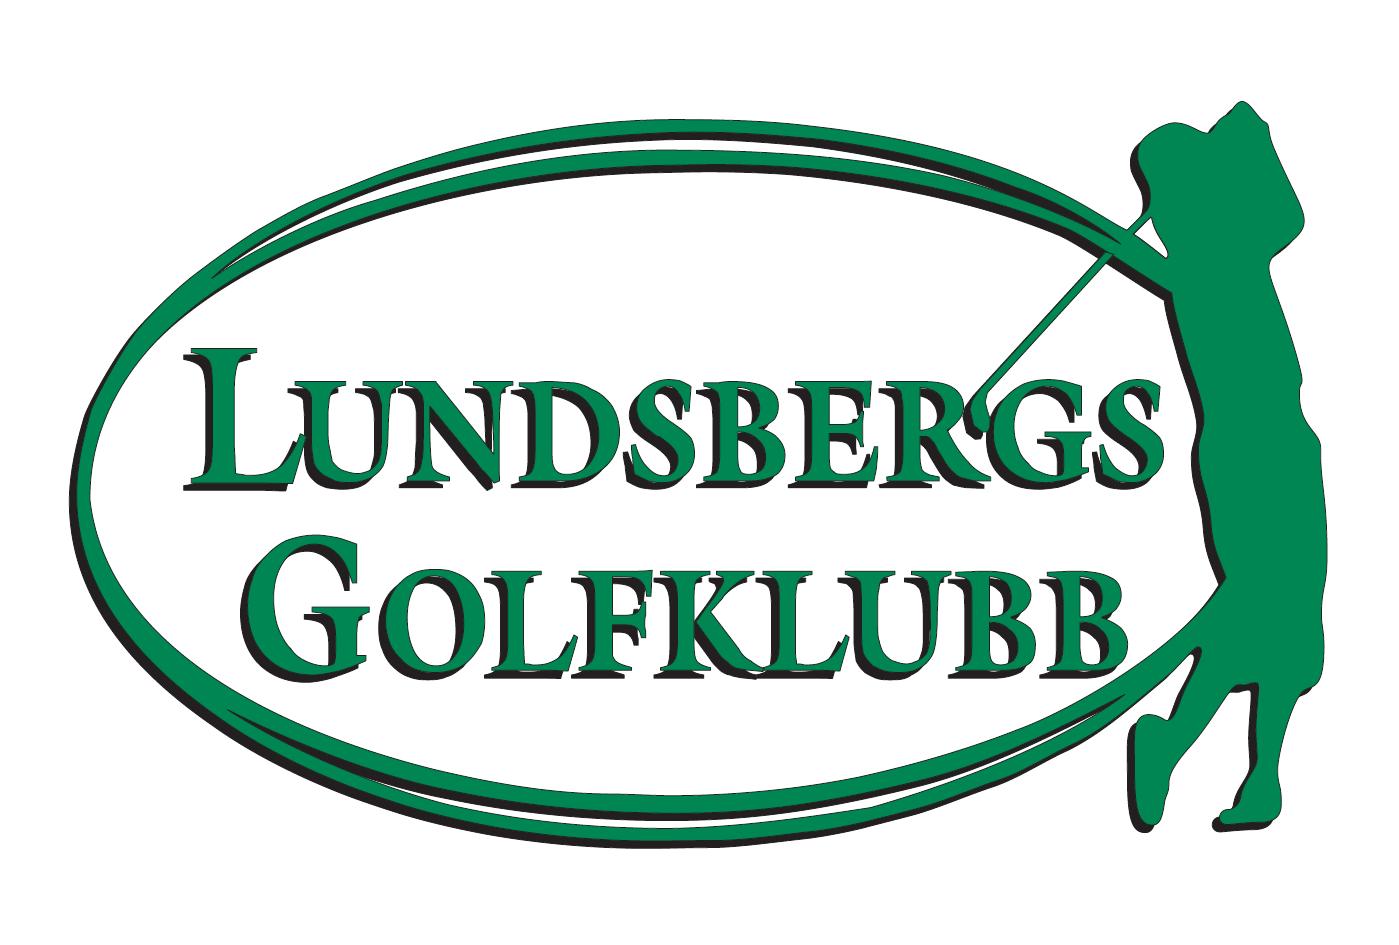 Lundsbergs Golfklubb